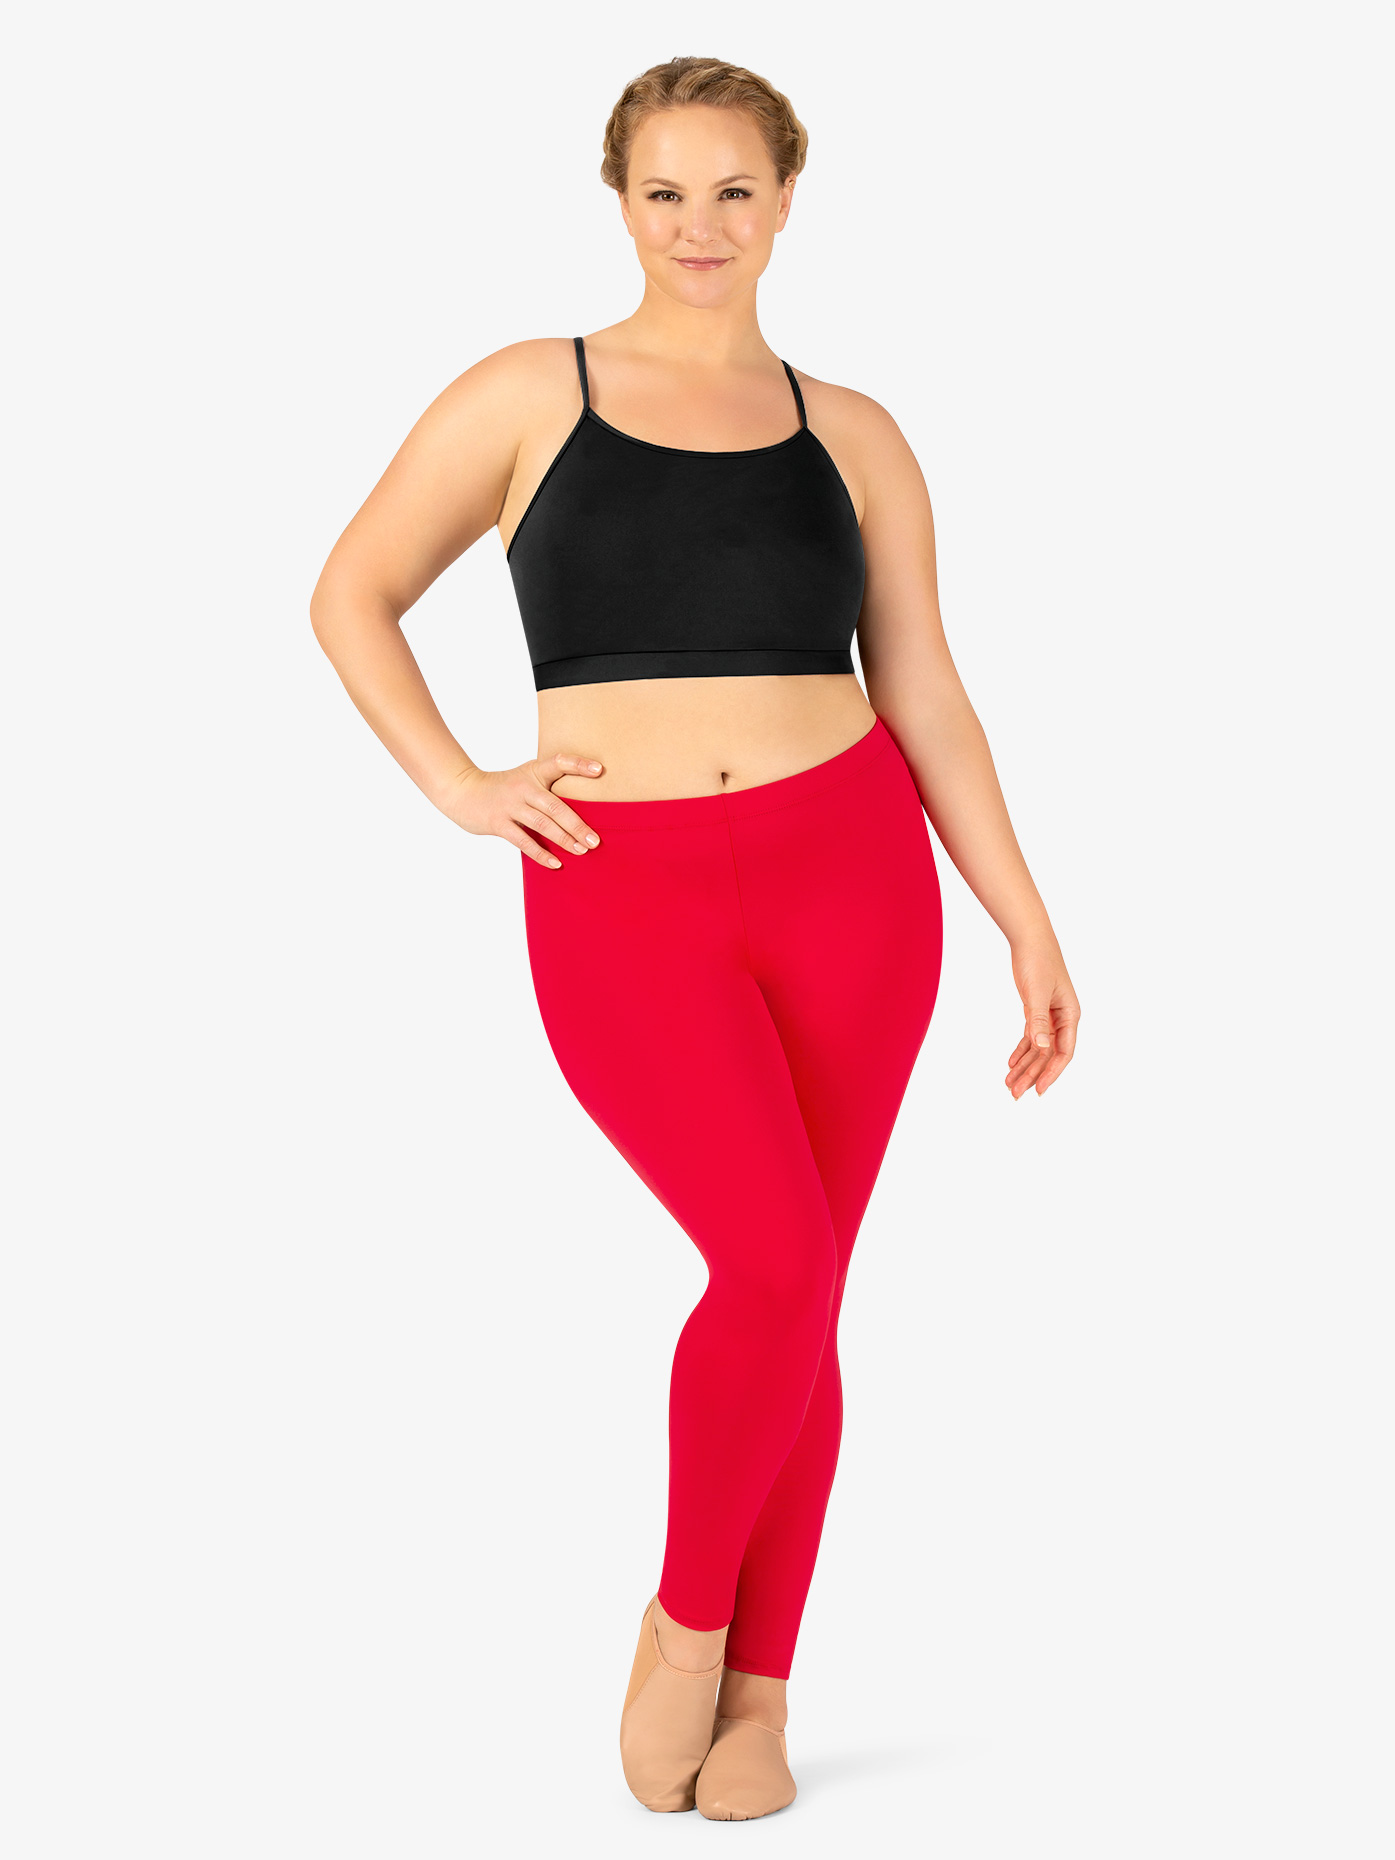 c08840b570f Womens Plus Size Team Basic Compression Dance Legging - Style No BT5207P. Loading  zoom